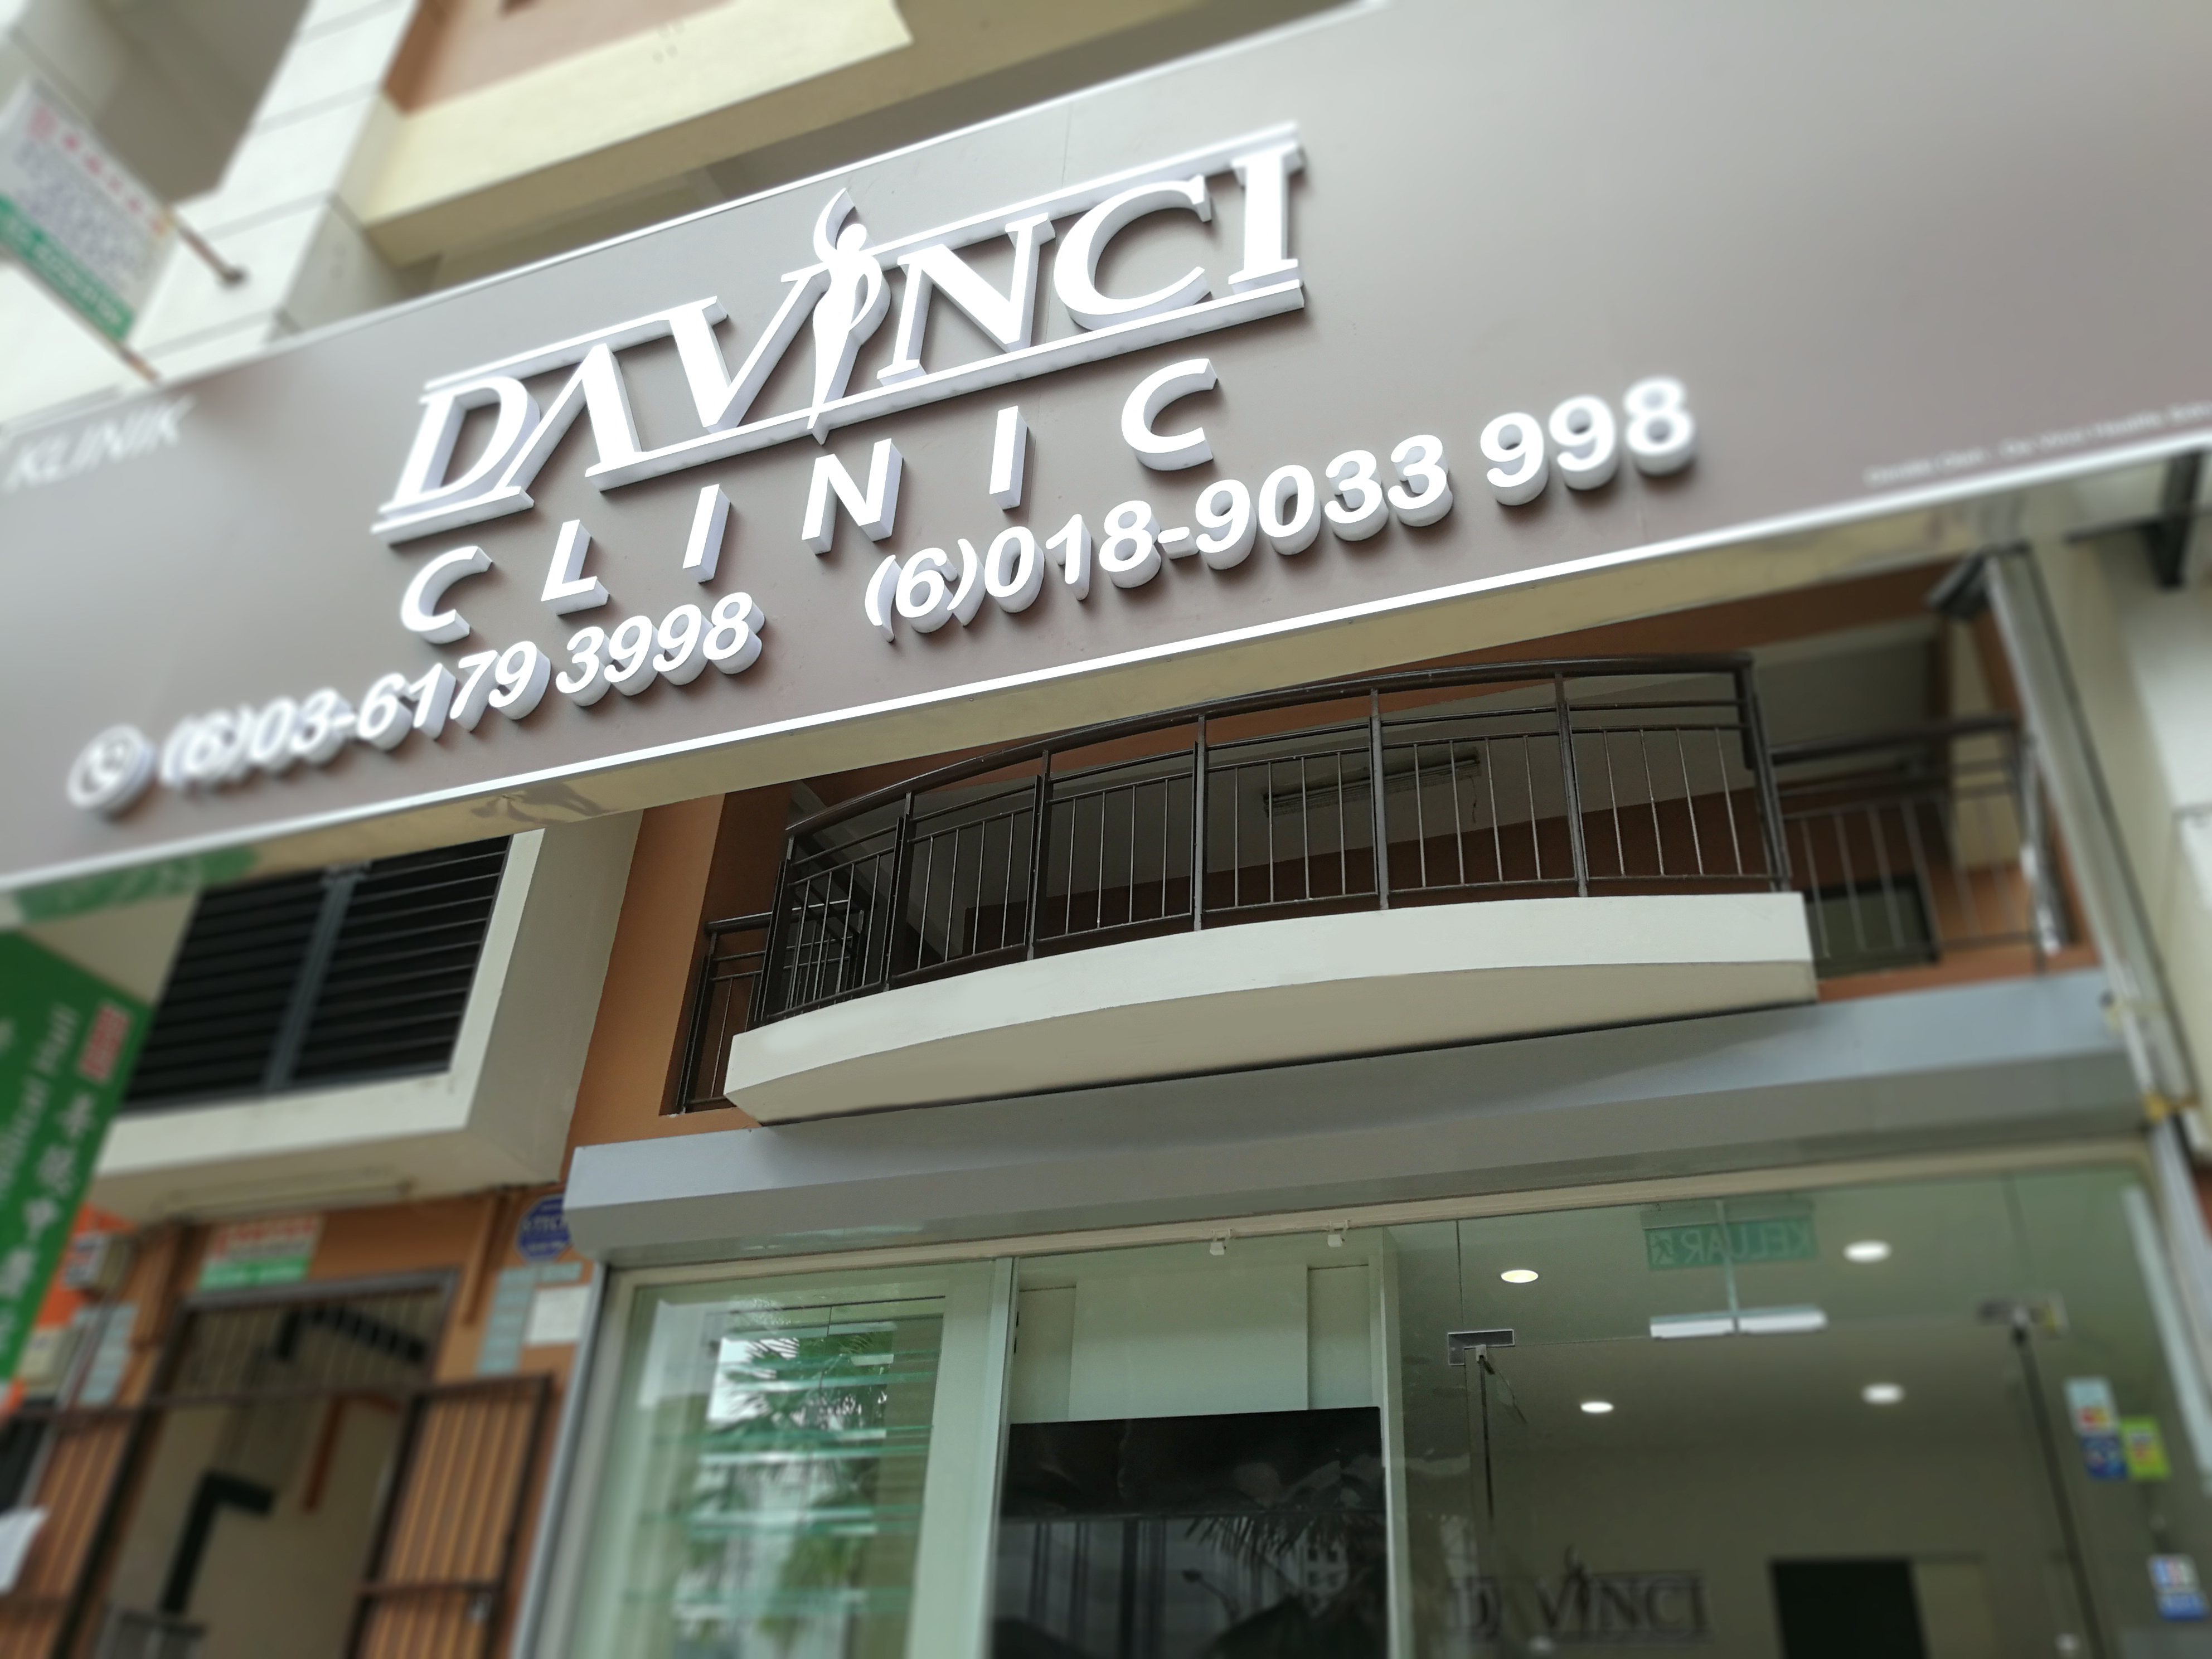 Da Vinci Clinic - Kepong